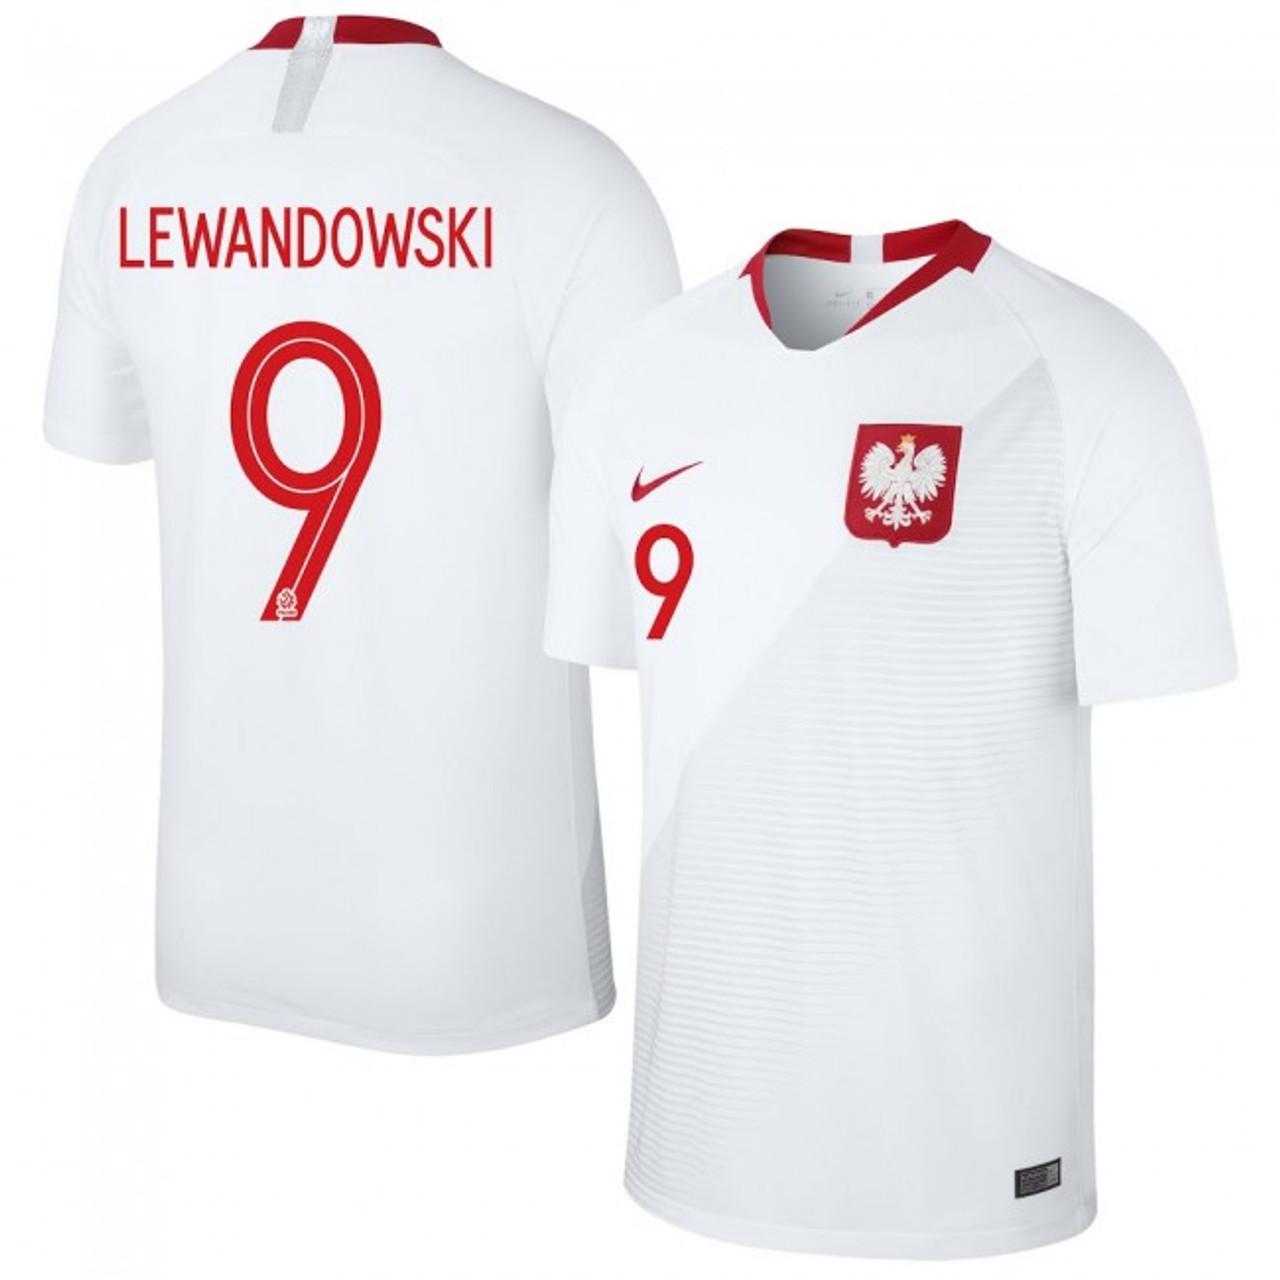 75e4437be NIKE POLAND 2018 `LEWANDOWSKI`HOME JERSEY WHITE - Soccer Plus